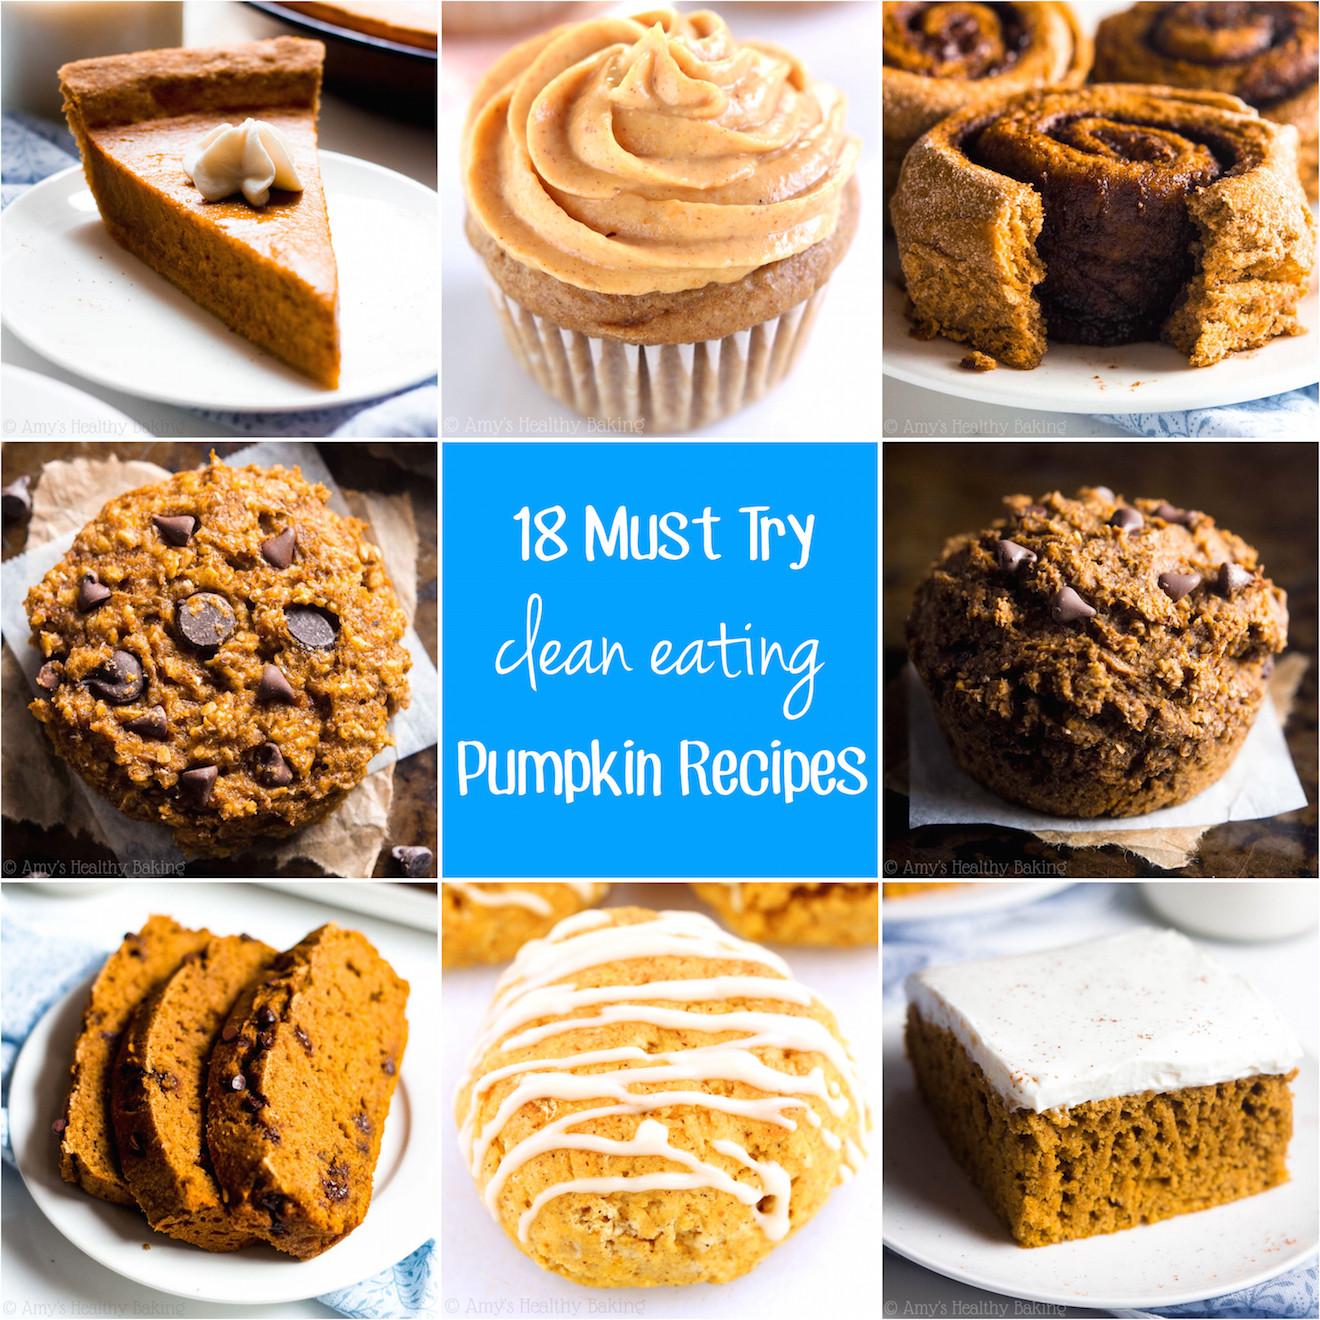 Pumpkin Dessert Recipes Healthy  healthy pumpkin dessert recipes